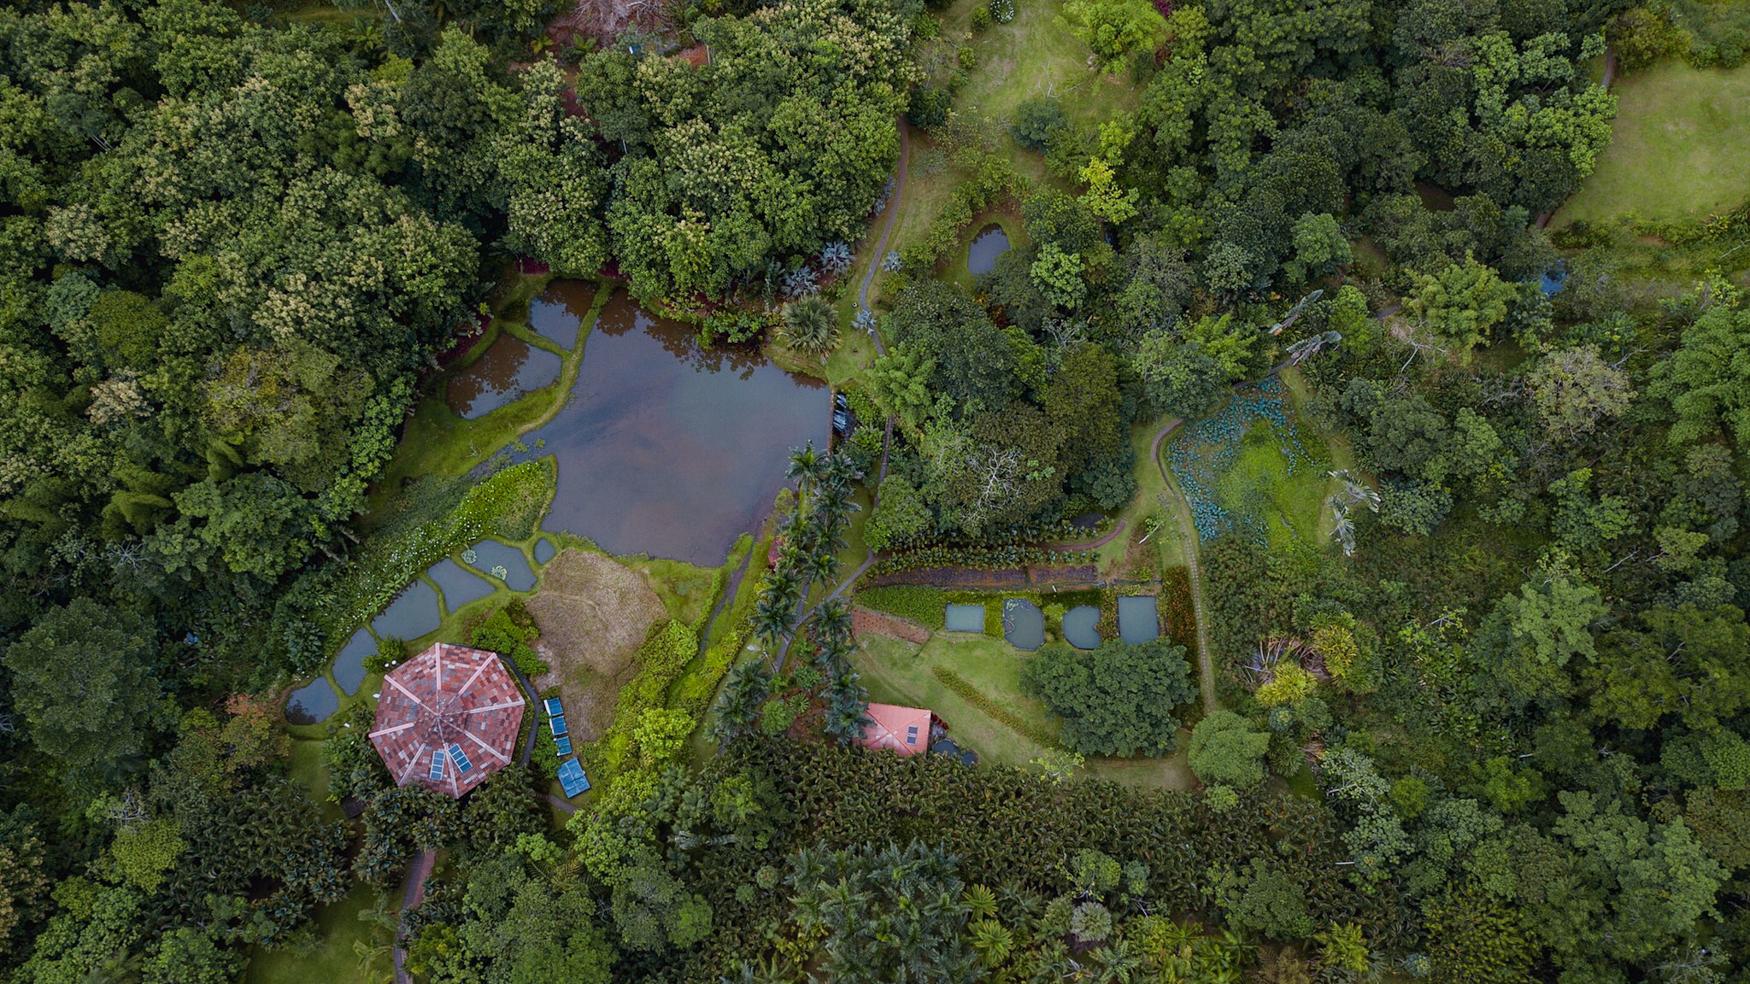 Yoga-Retreat-Photography-Costa-Rica-19.jpg